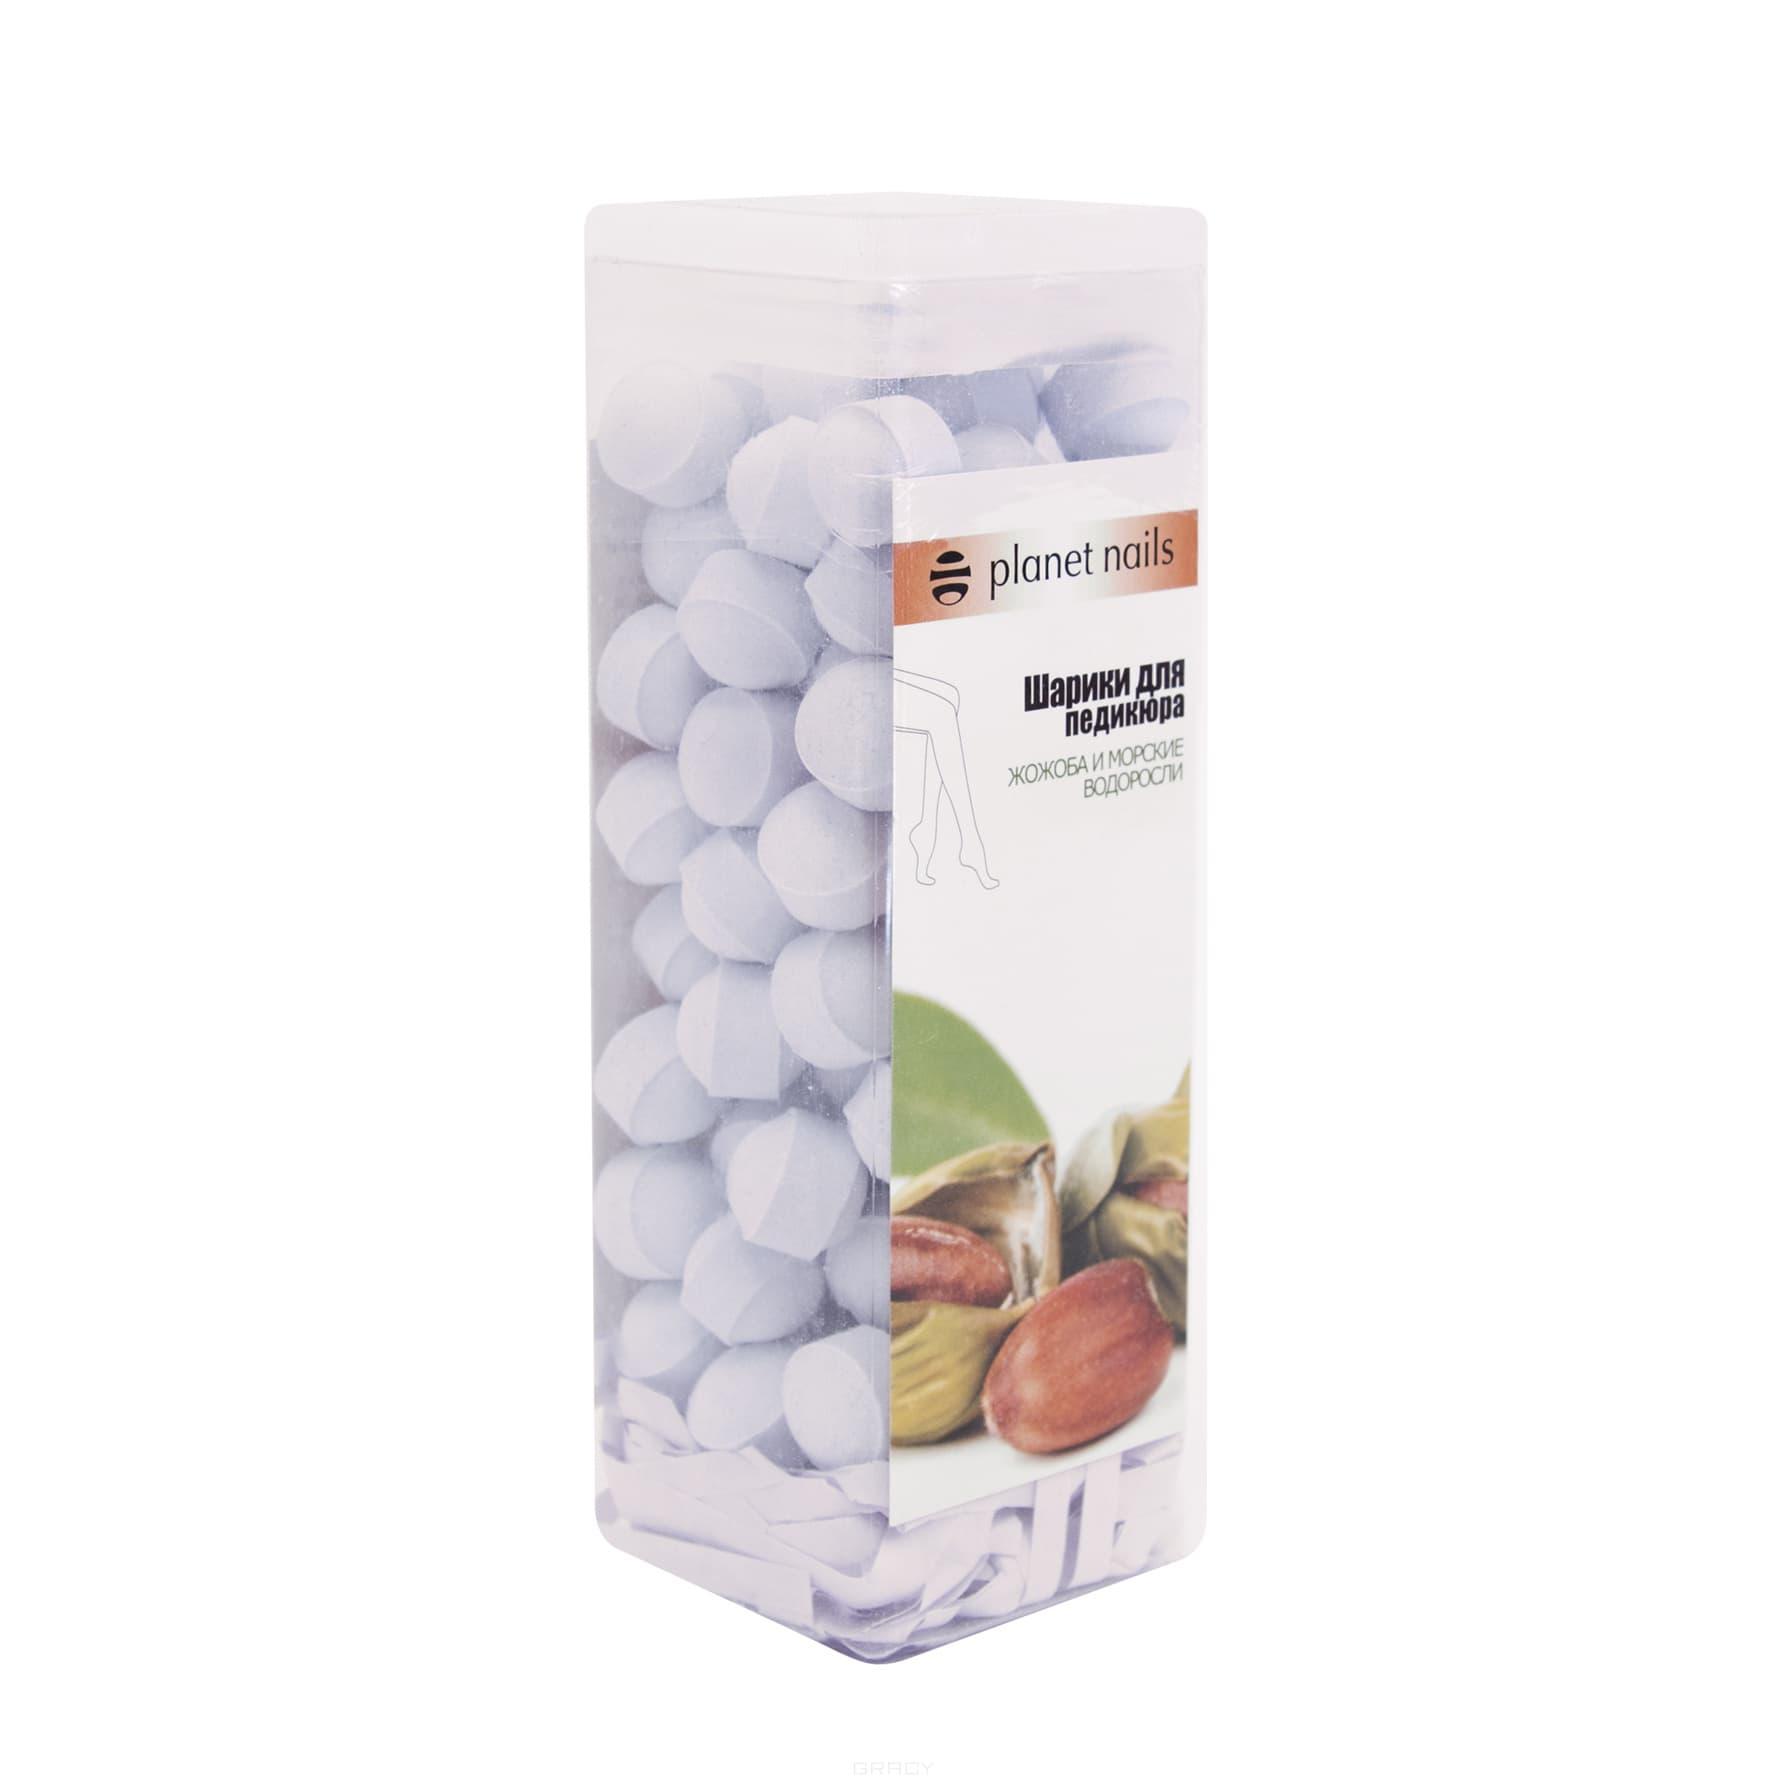 Planet Nails, Шарики для педикюра Жожоба и водоросли, 250 г